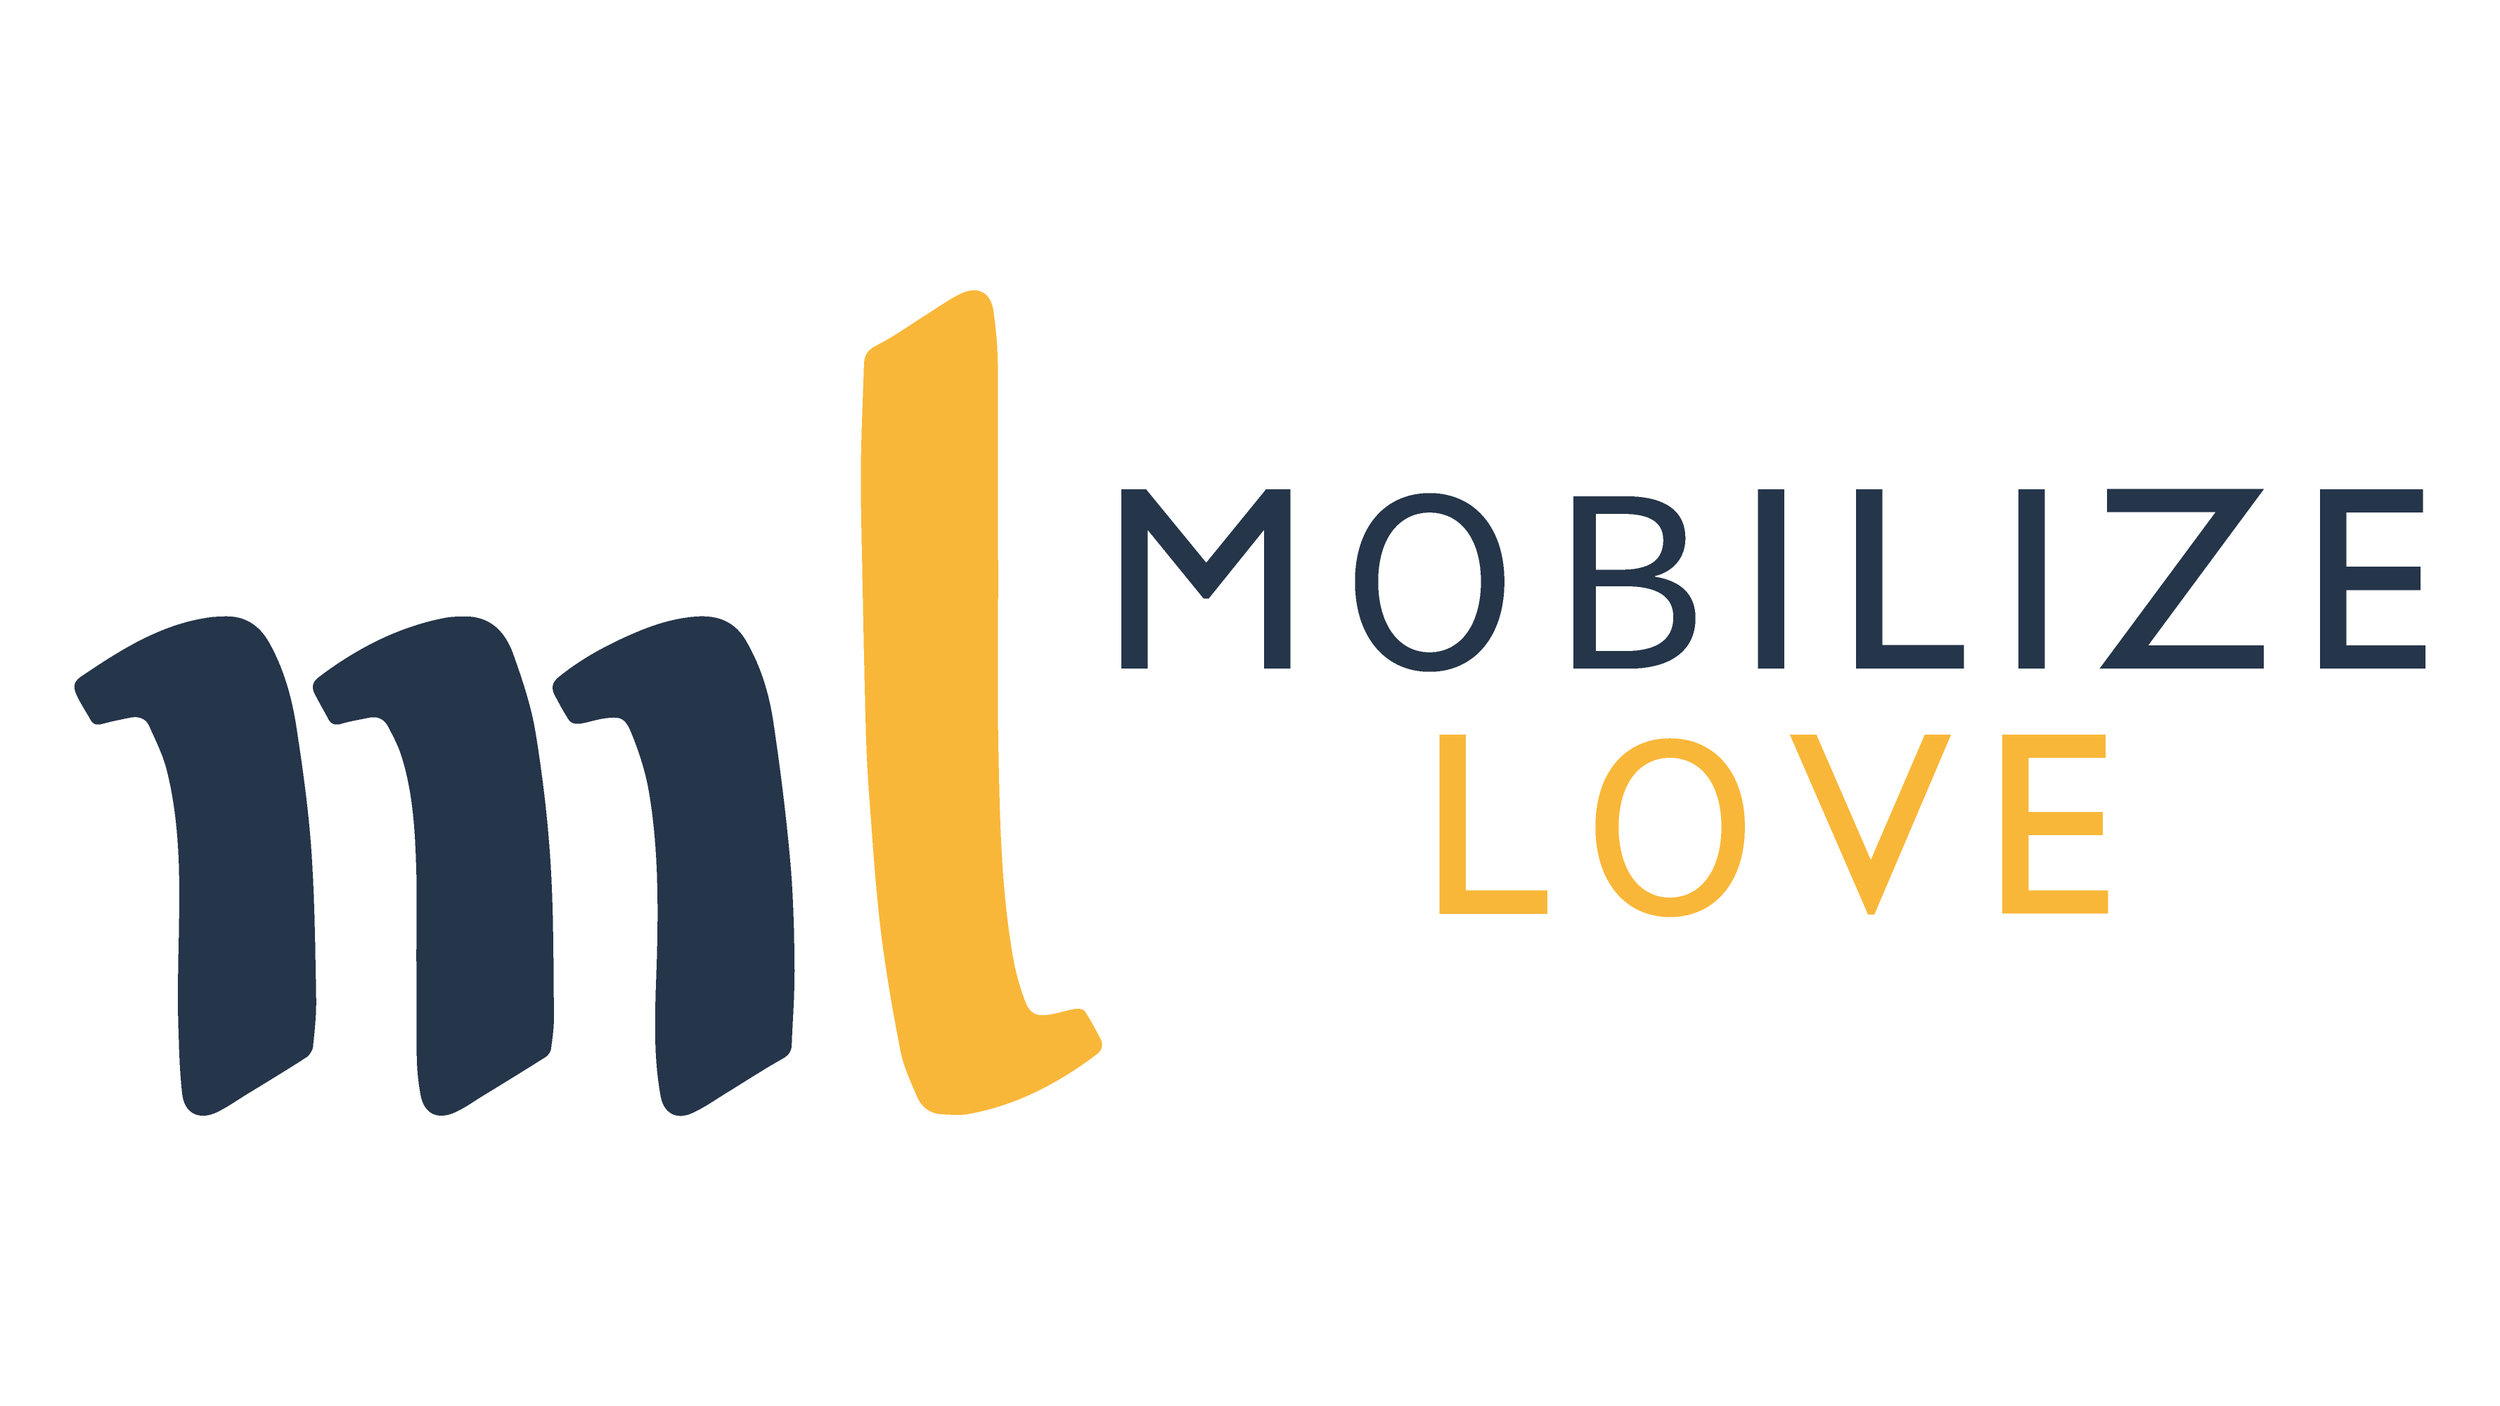 Mobilize-Love.jpg